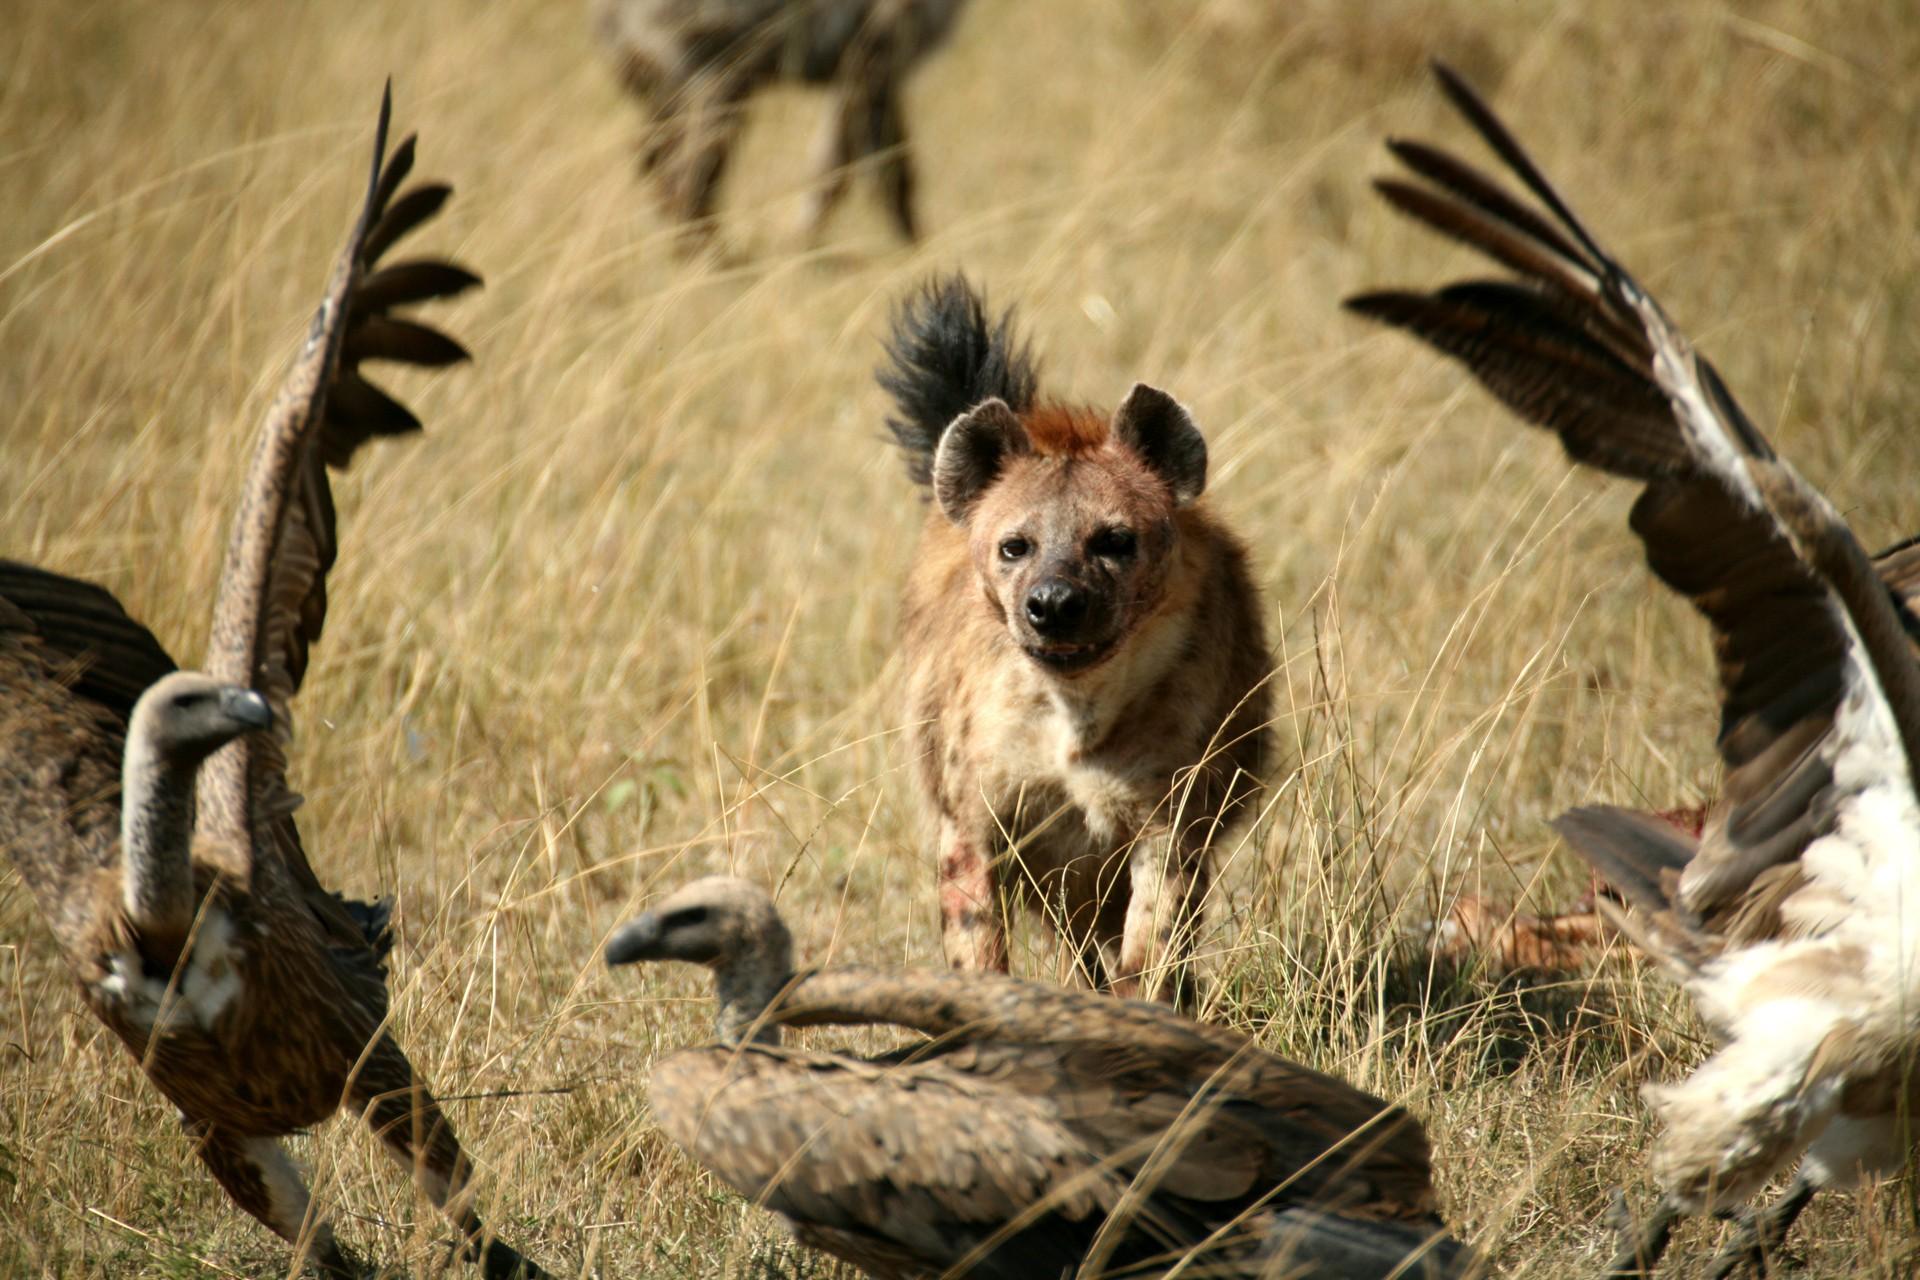 Hyena chasing vultures in Kenya